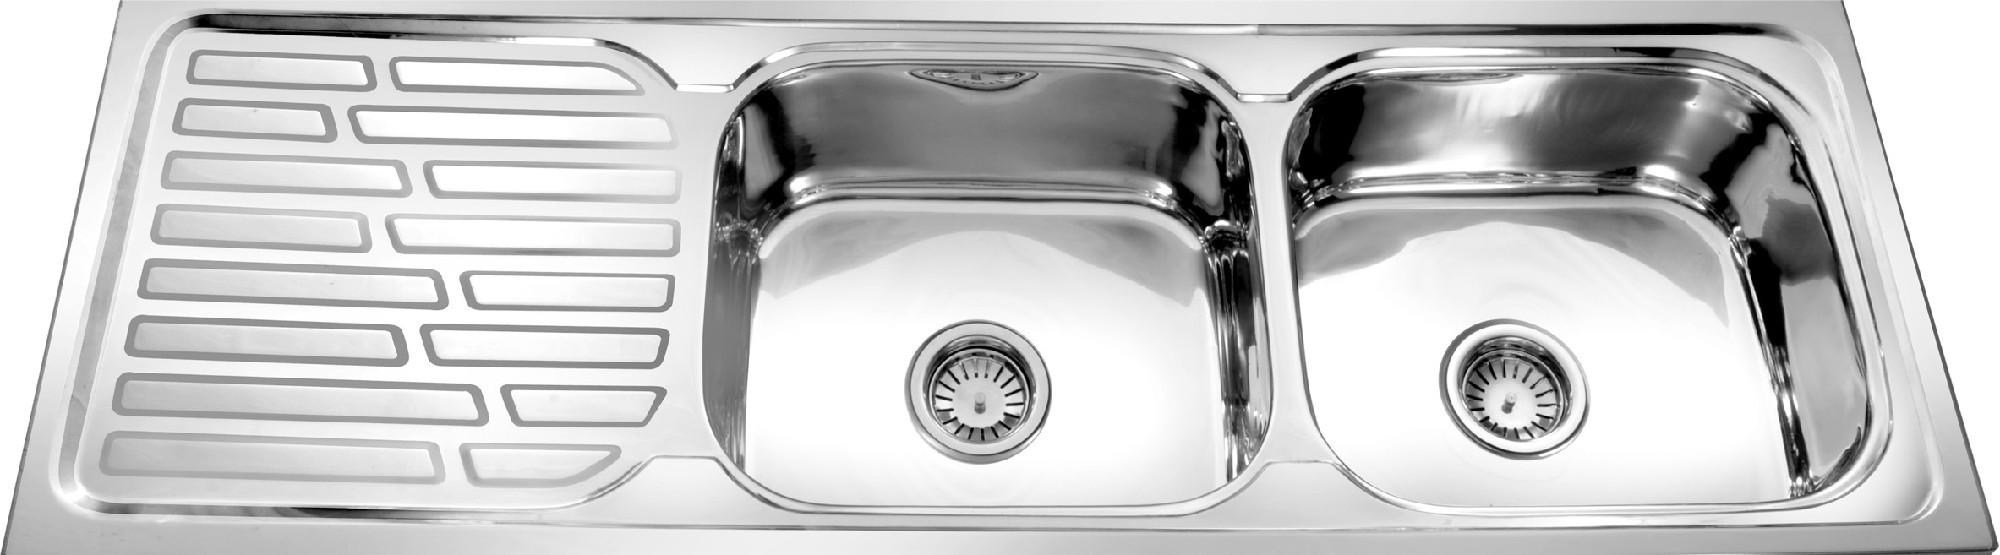 Kitchen sink with drain board photo - 3